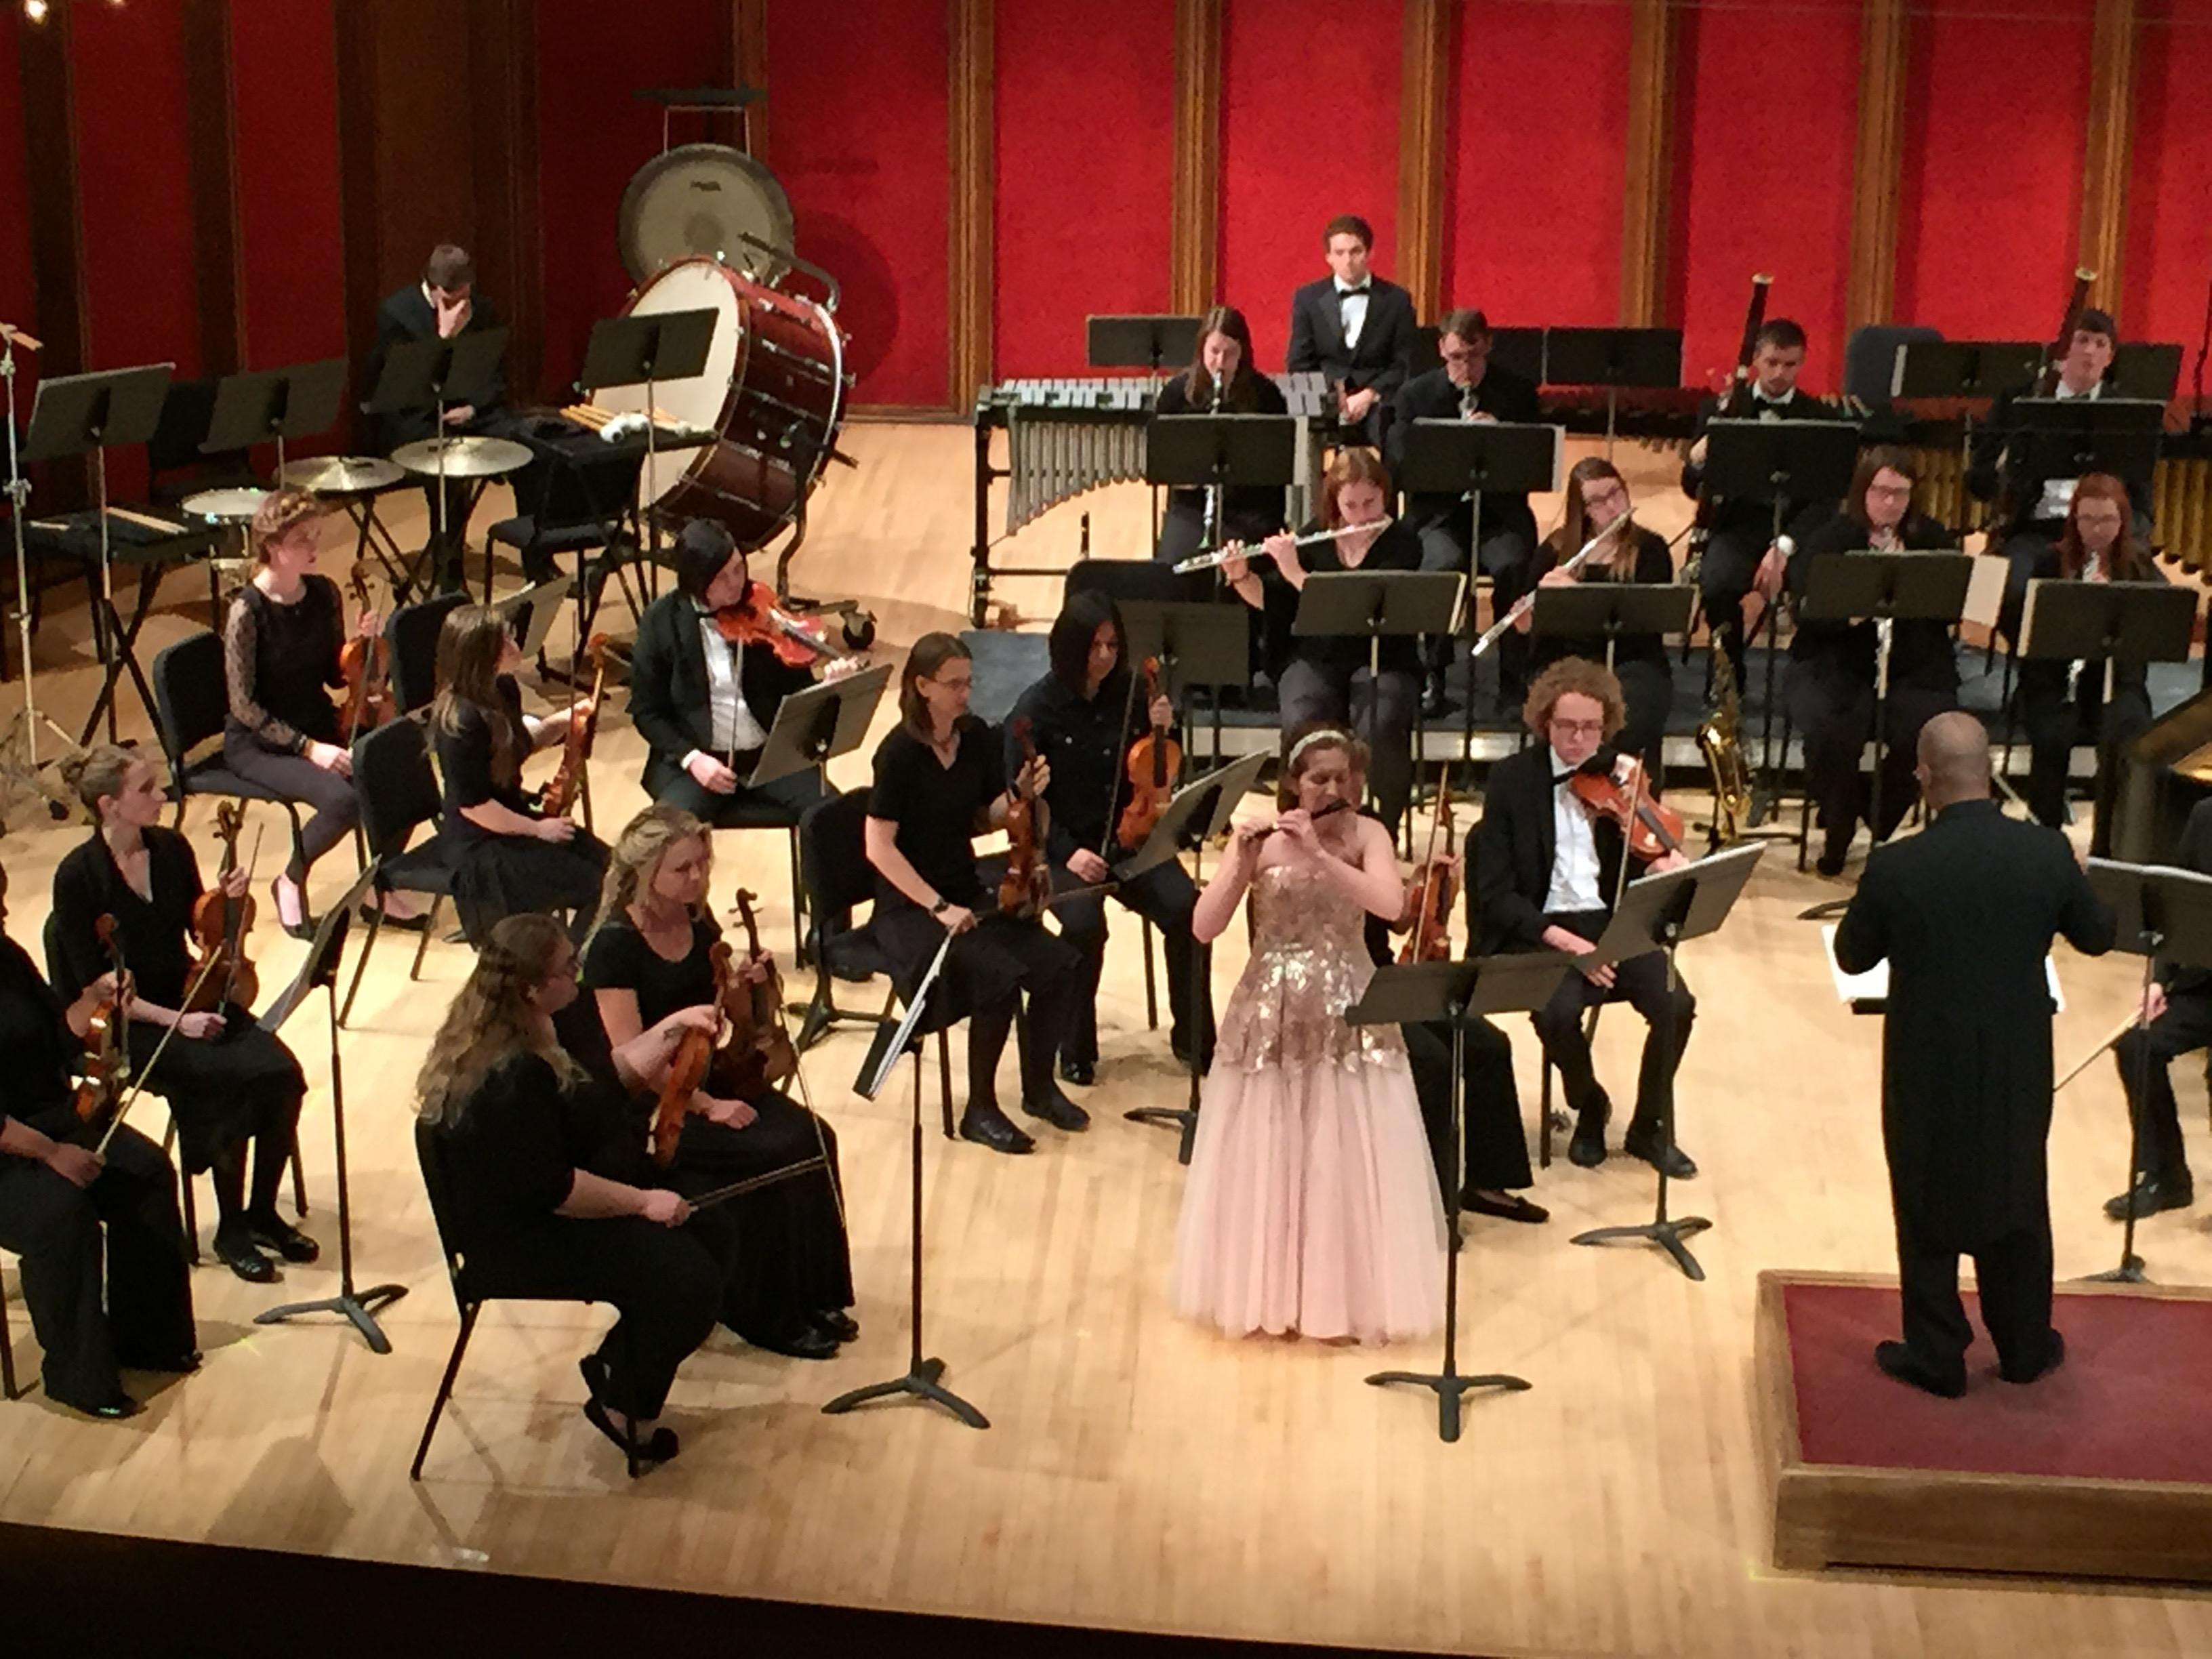 Concerto winner 2015